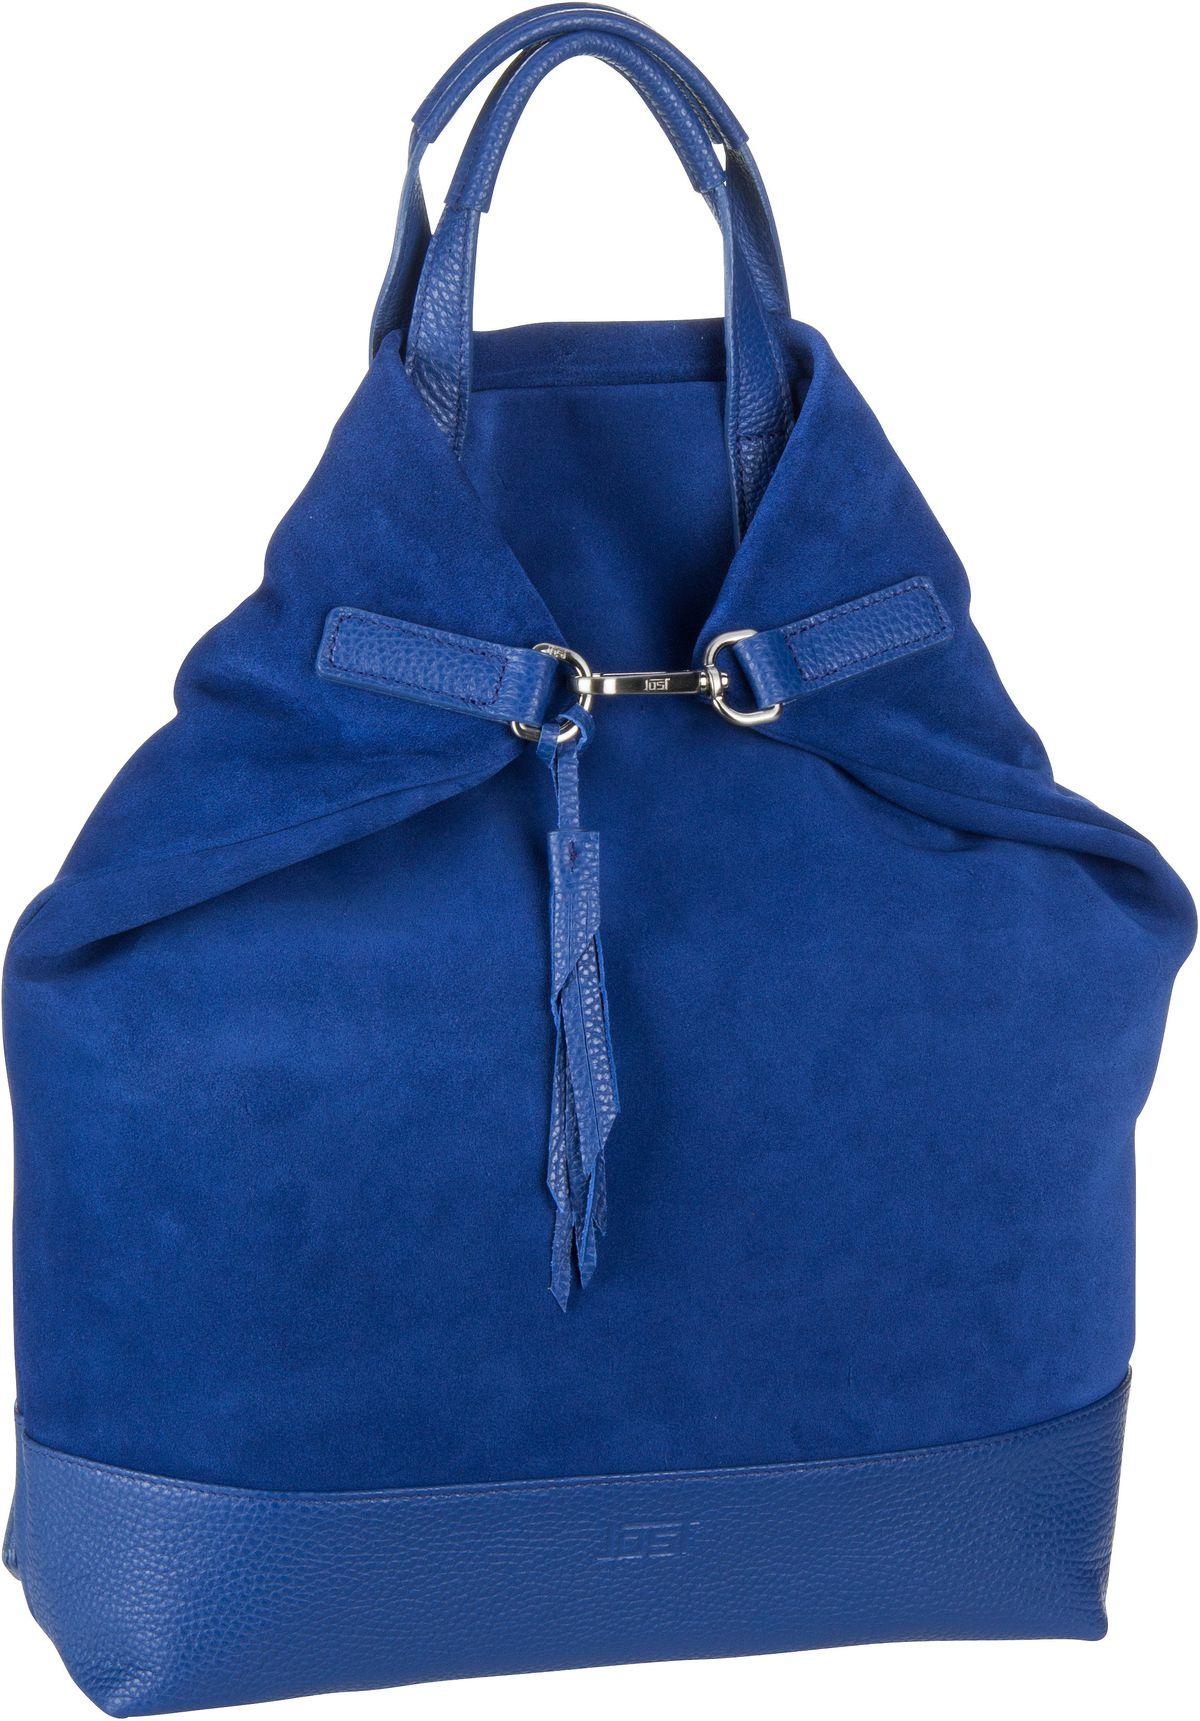 Rucksack / Daypack Motala 1730 X-Change Bag S Royalblue